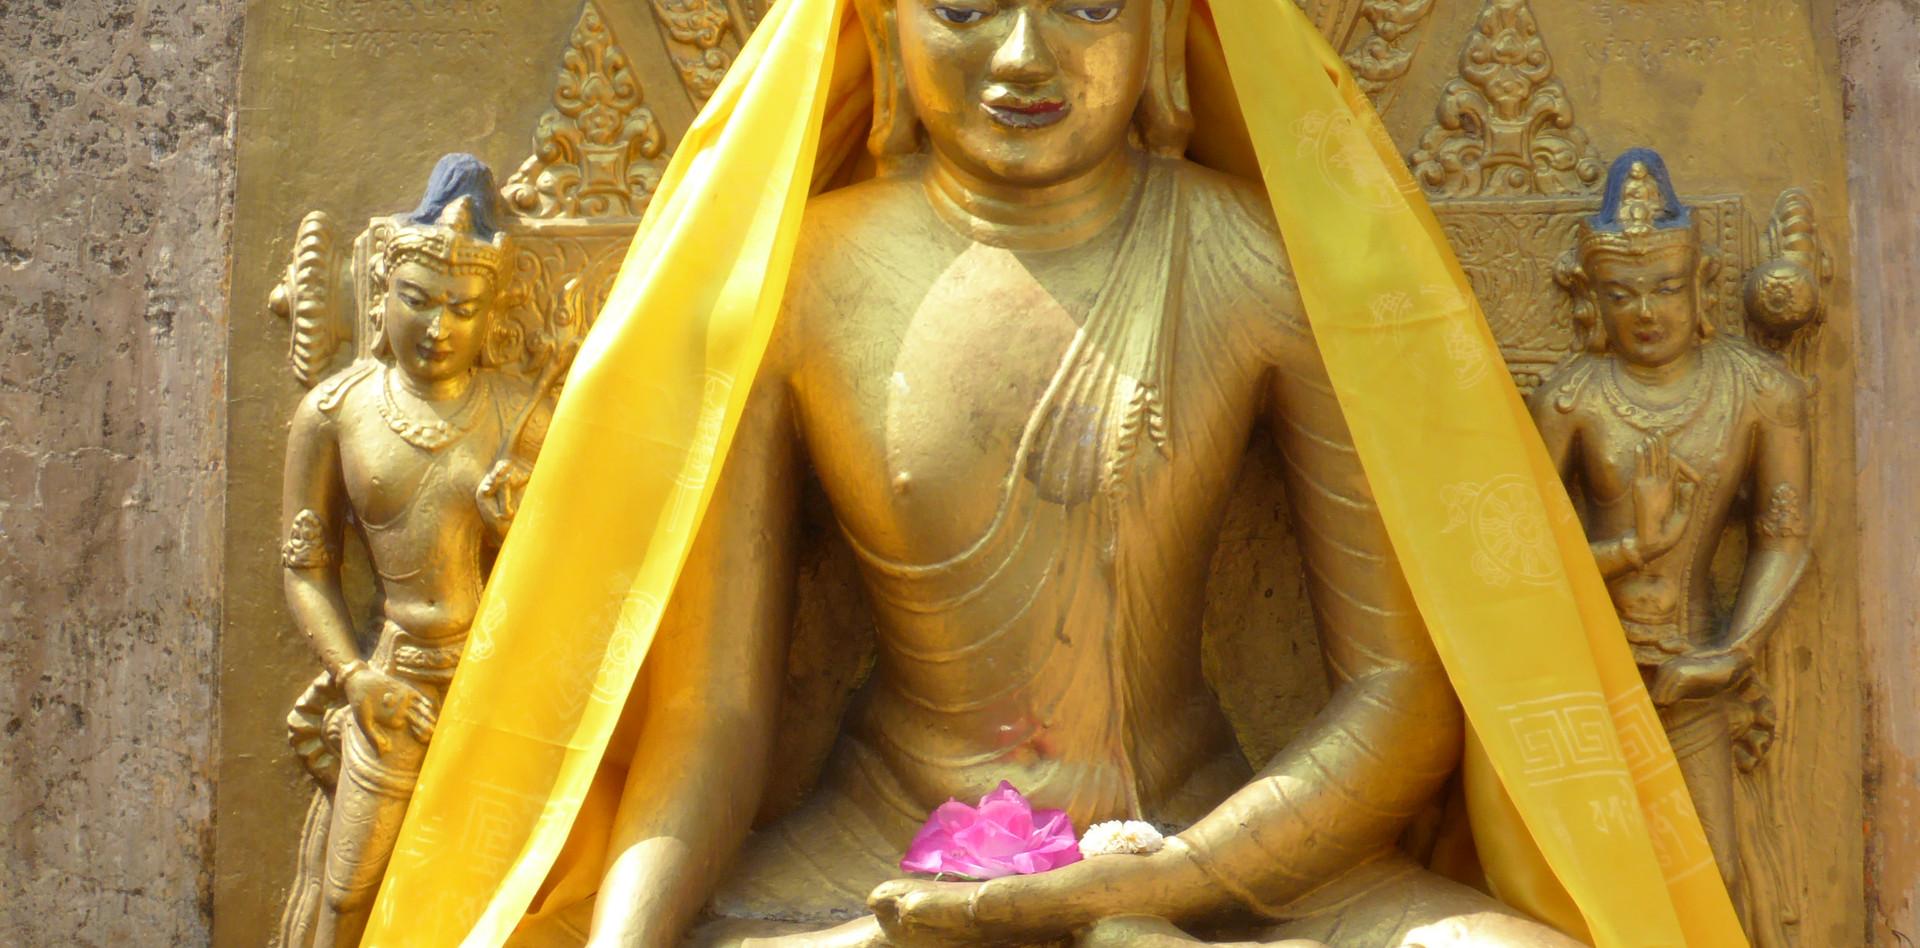 Buddha Statue in Bodhgaya